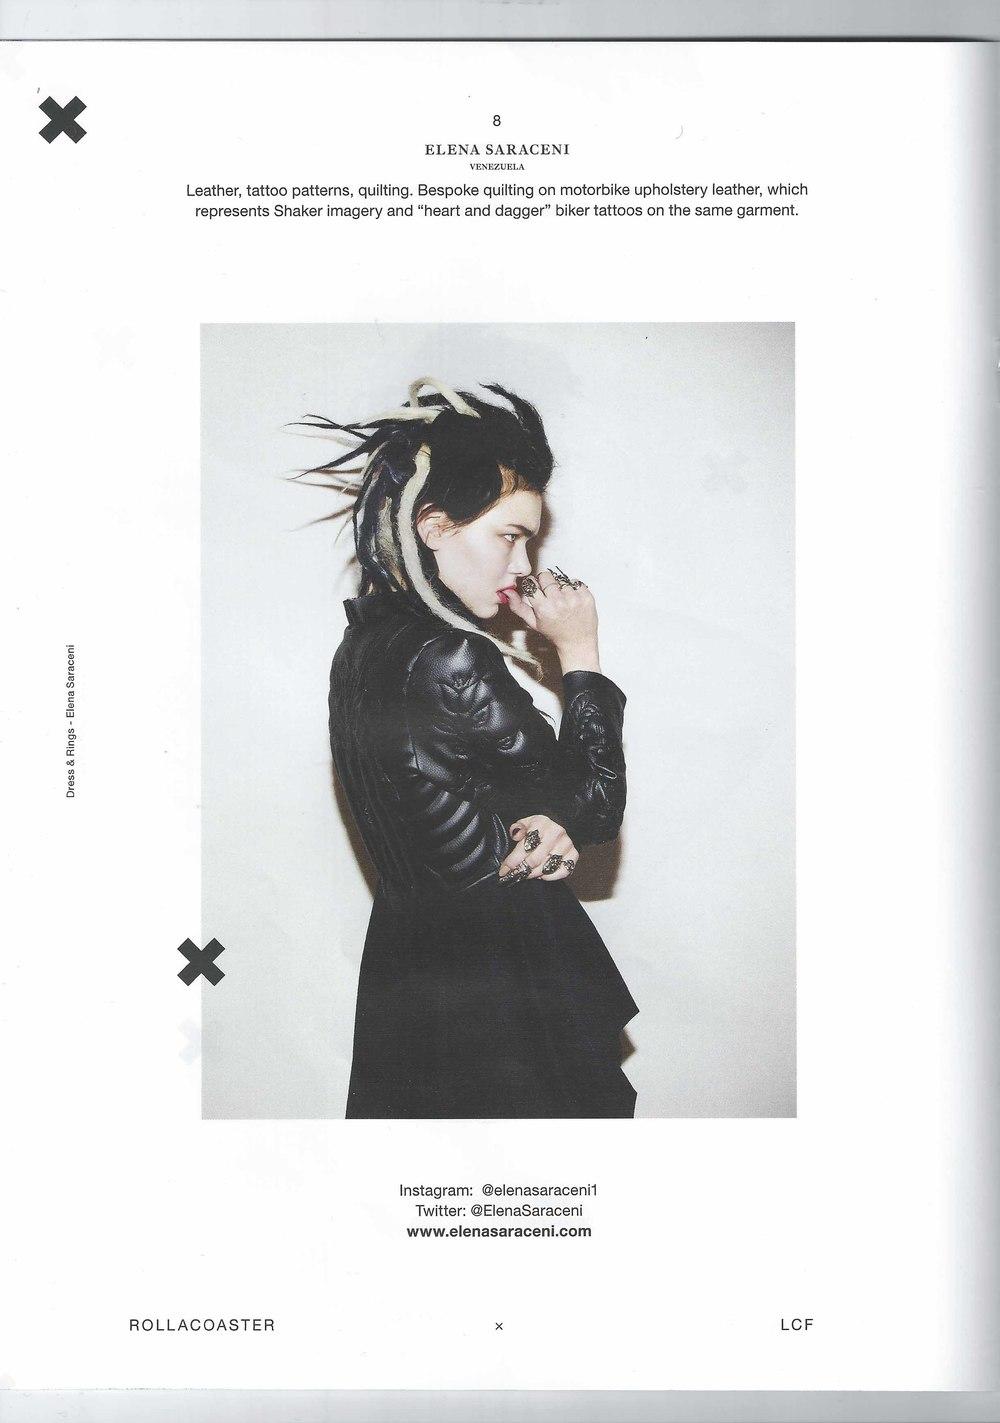 elenasaracenirollacoastermagazine.jpg